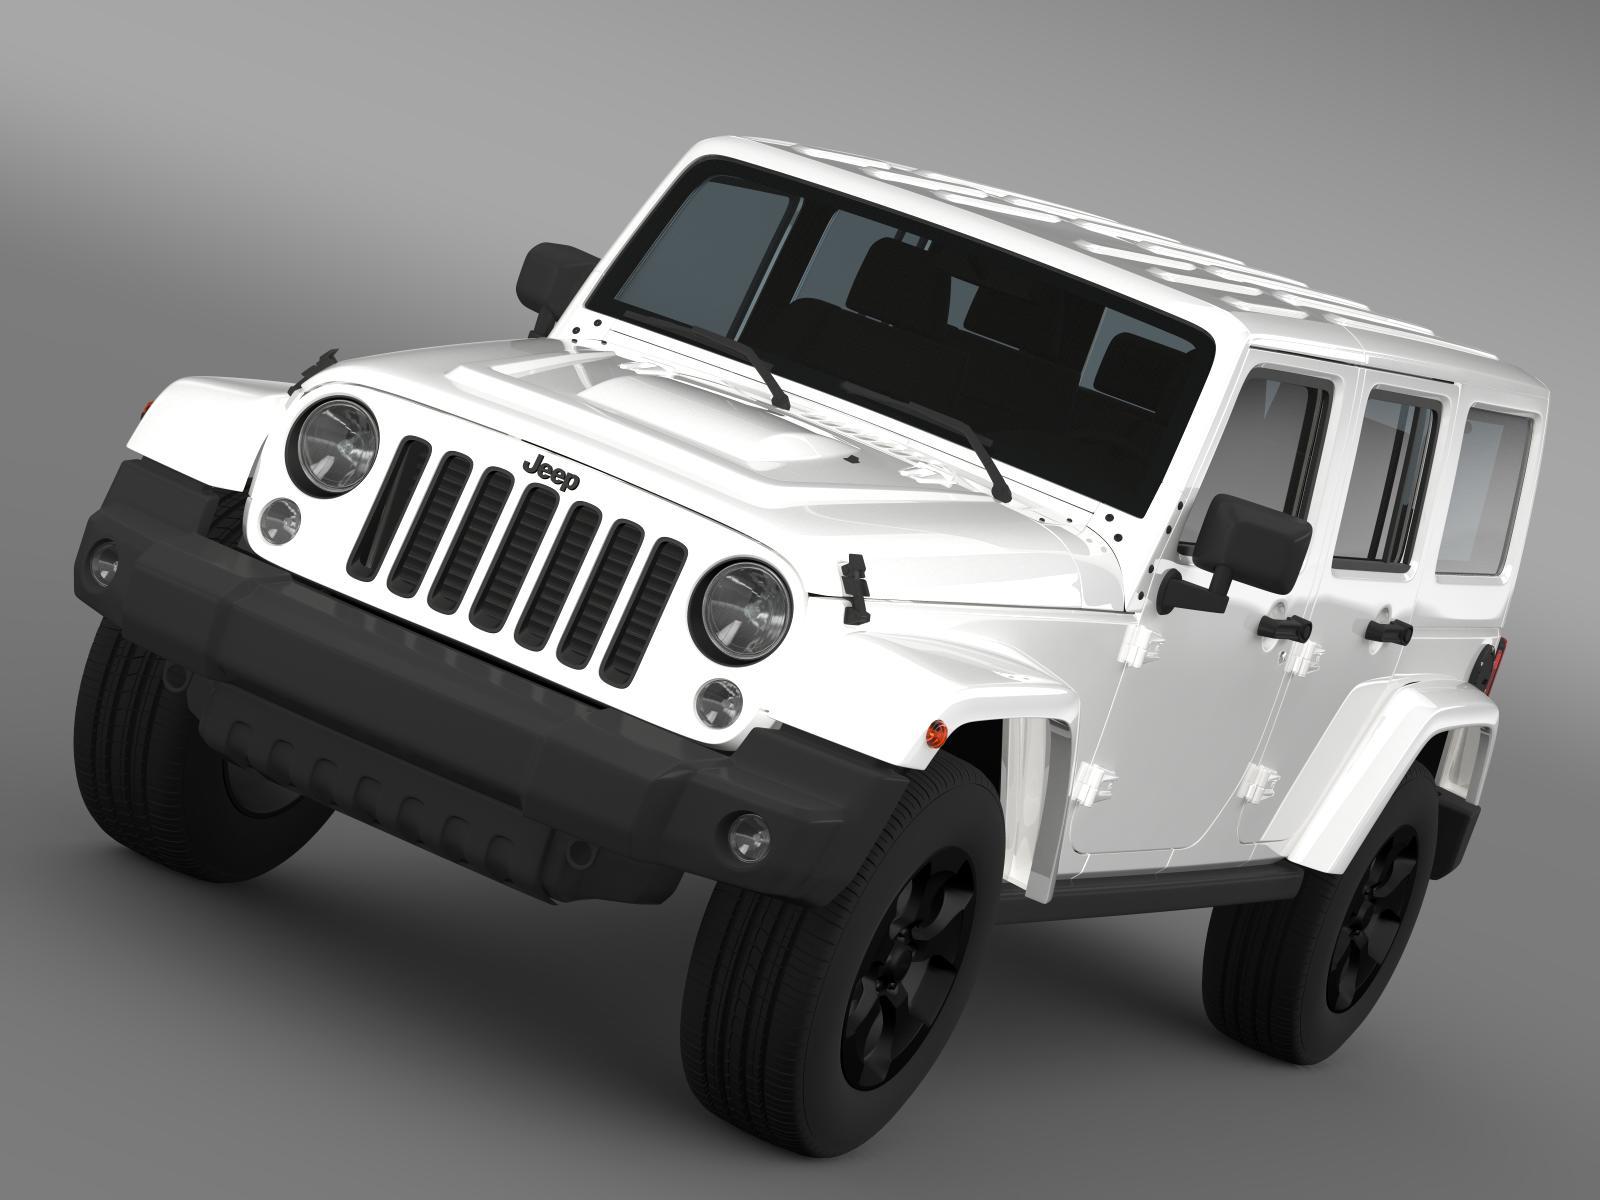 jeep wrangler black edition 2 2015 3d model 3ds max fbx c4d lwo ma mb hrc xsi obj 207777